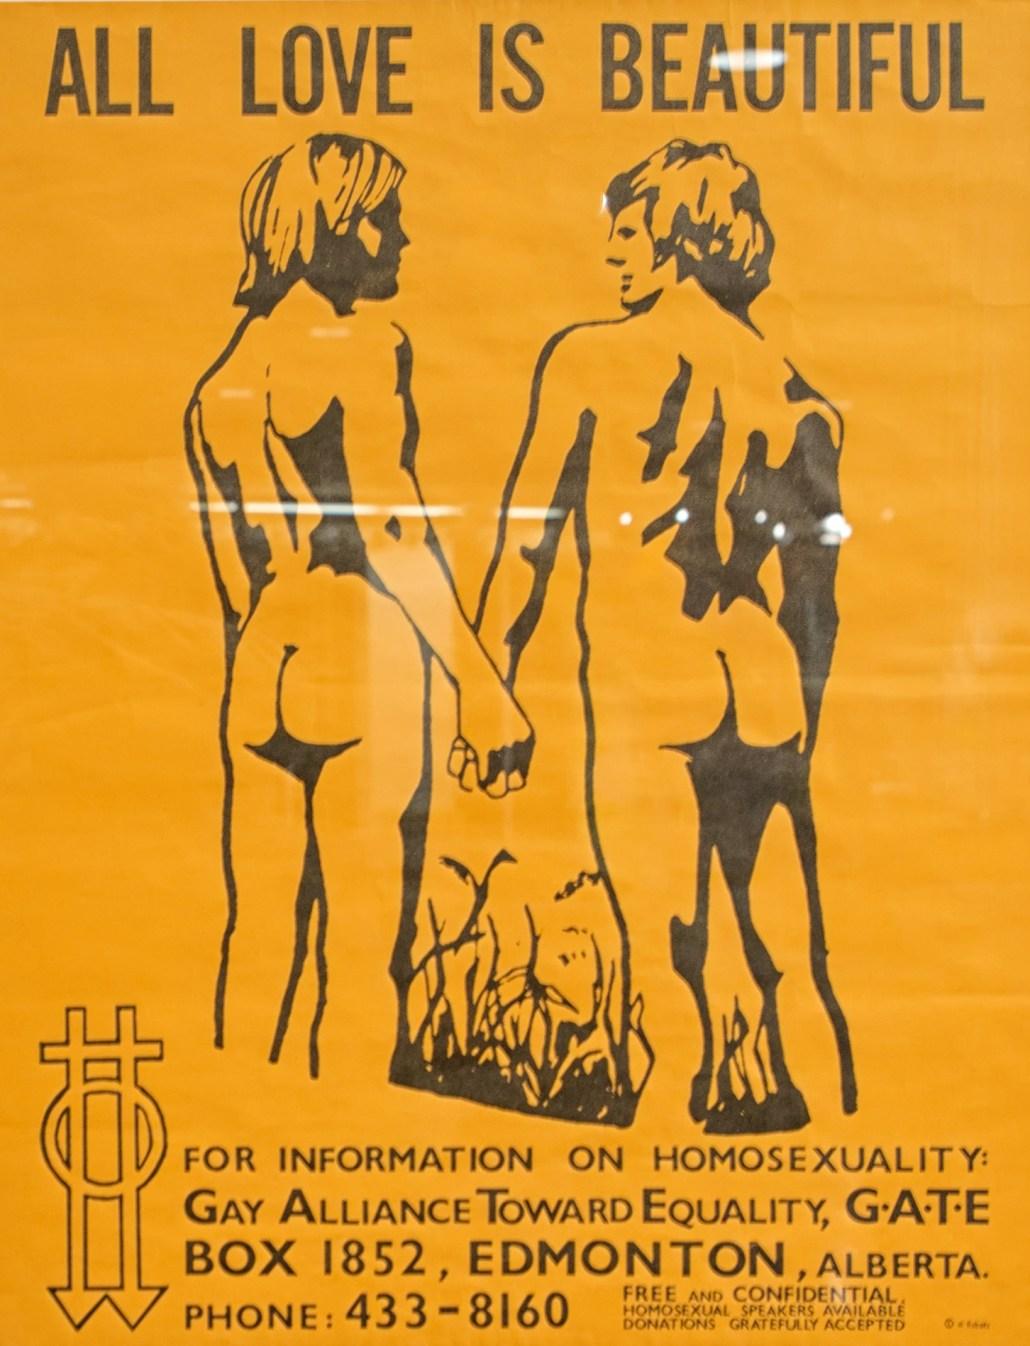 Photo courtesy of Edmonton Queer History Project © 2015 https://edmontonqueerhistoryproject.wordpress.com/